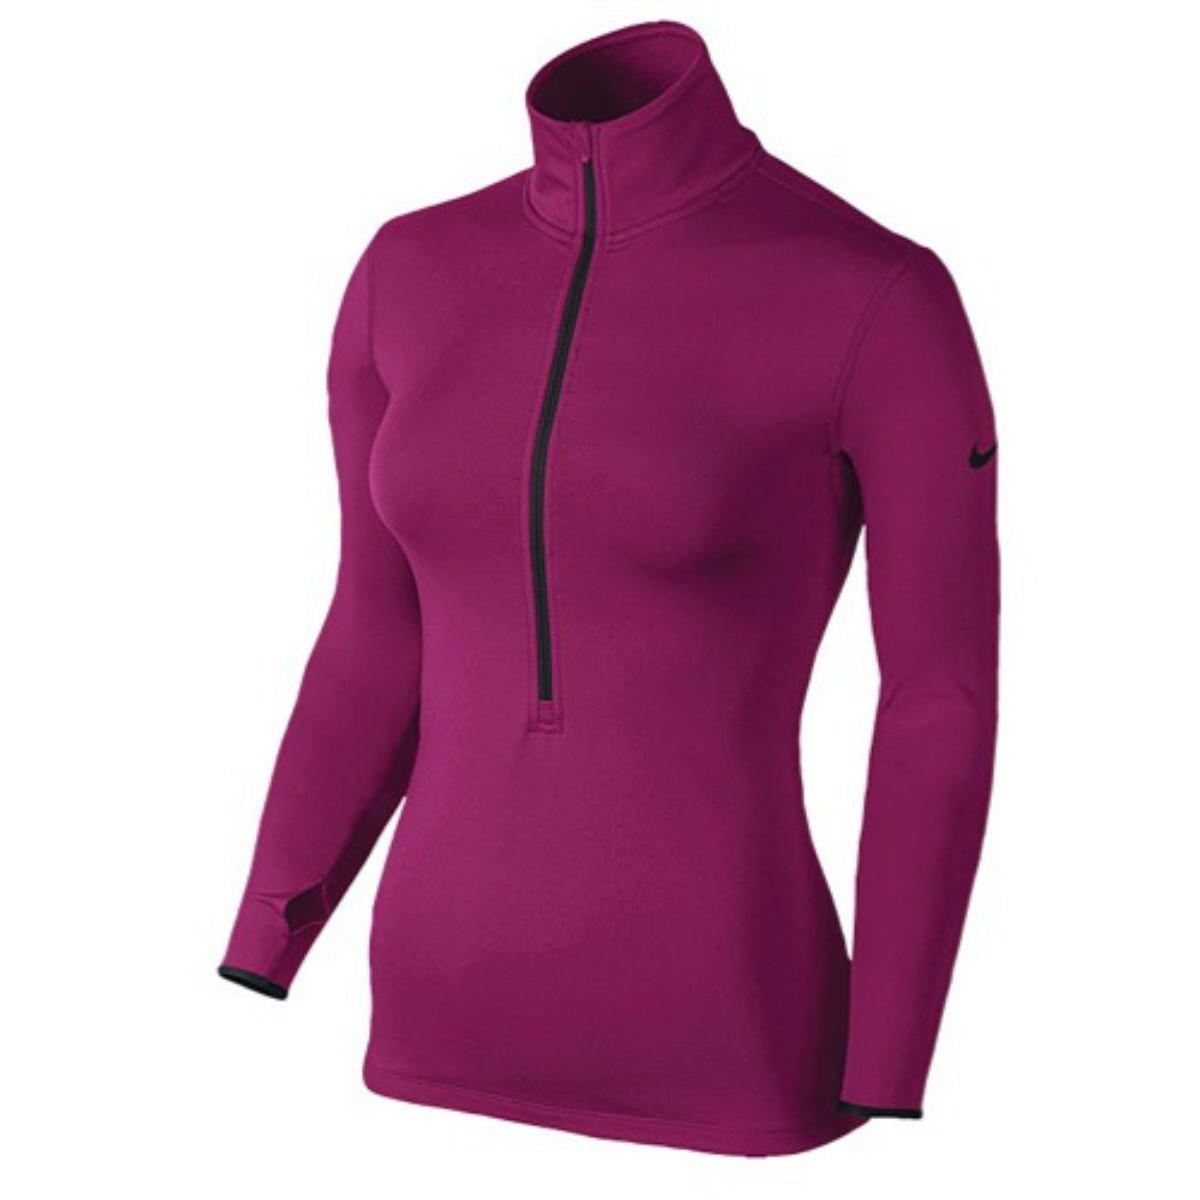 022184d2a ... pro boys half sleeve football compression shirt s; top 10 whole nike  half sleeve compression shirt chinabrands com ...